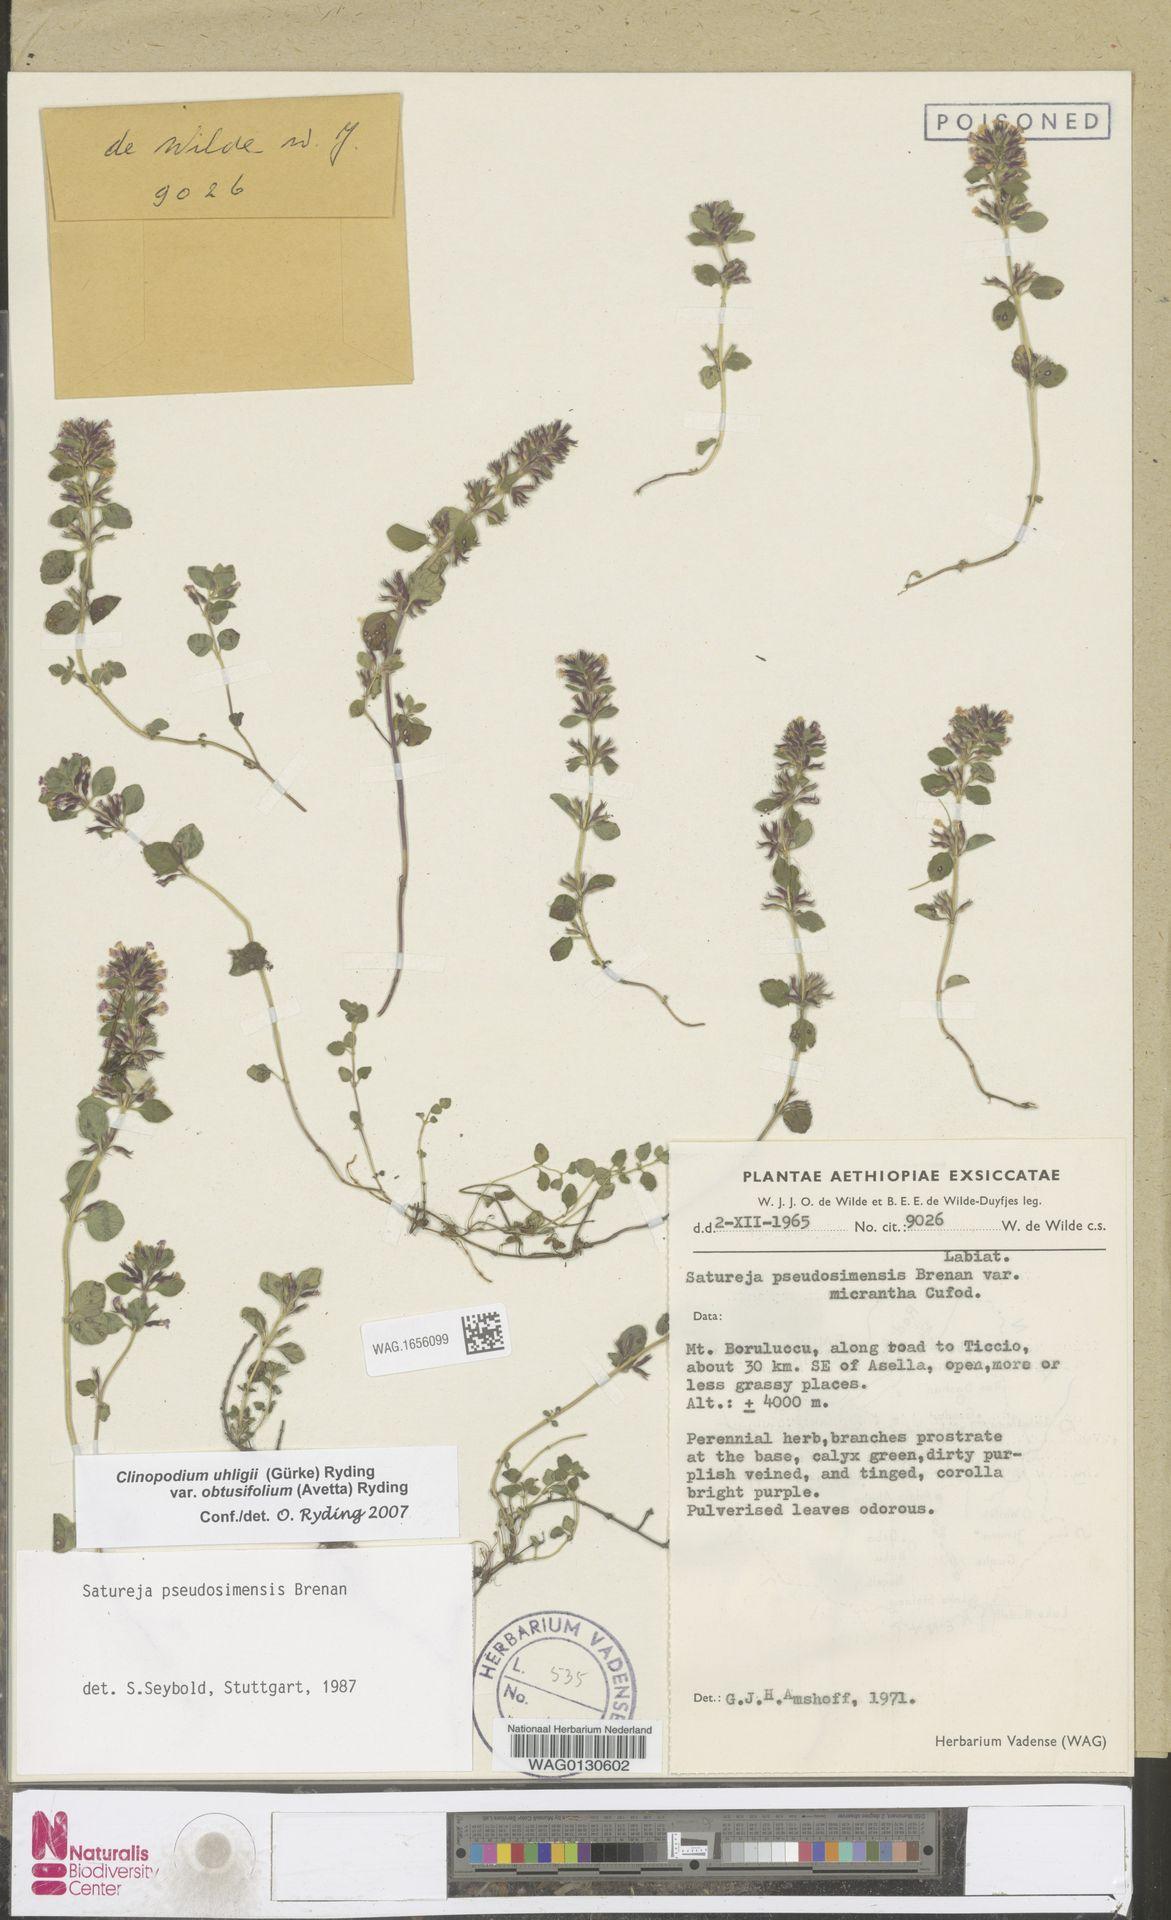 WAG.1656099 | Clinopodium uhligii var. obtusifolium (Avetta) Ryding